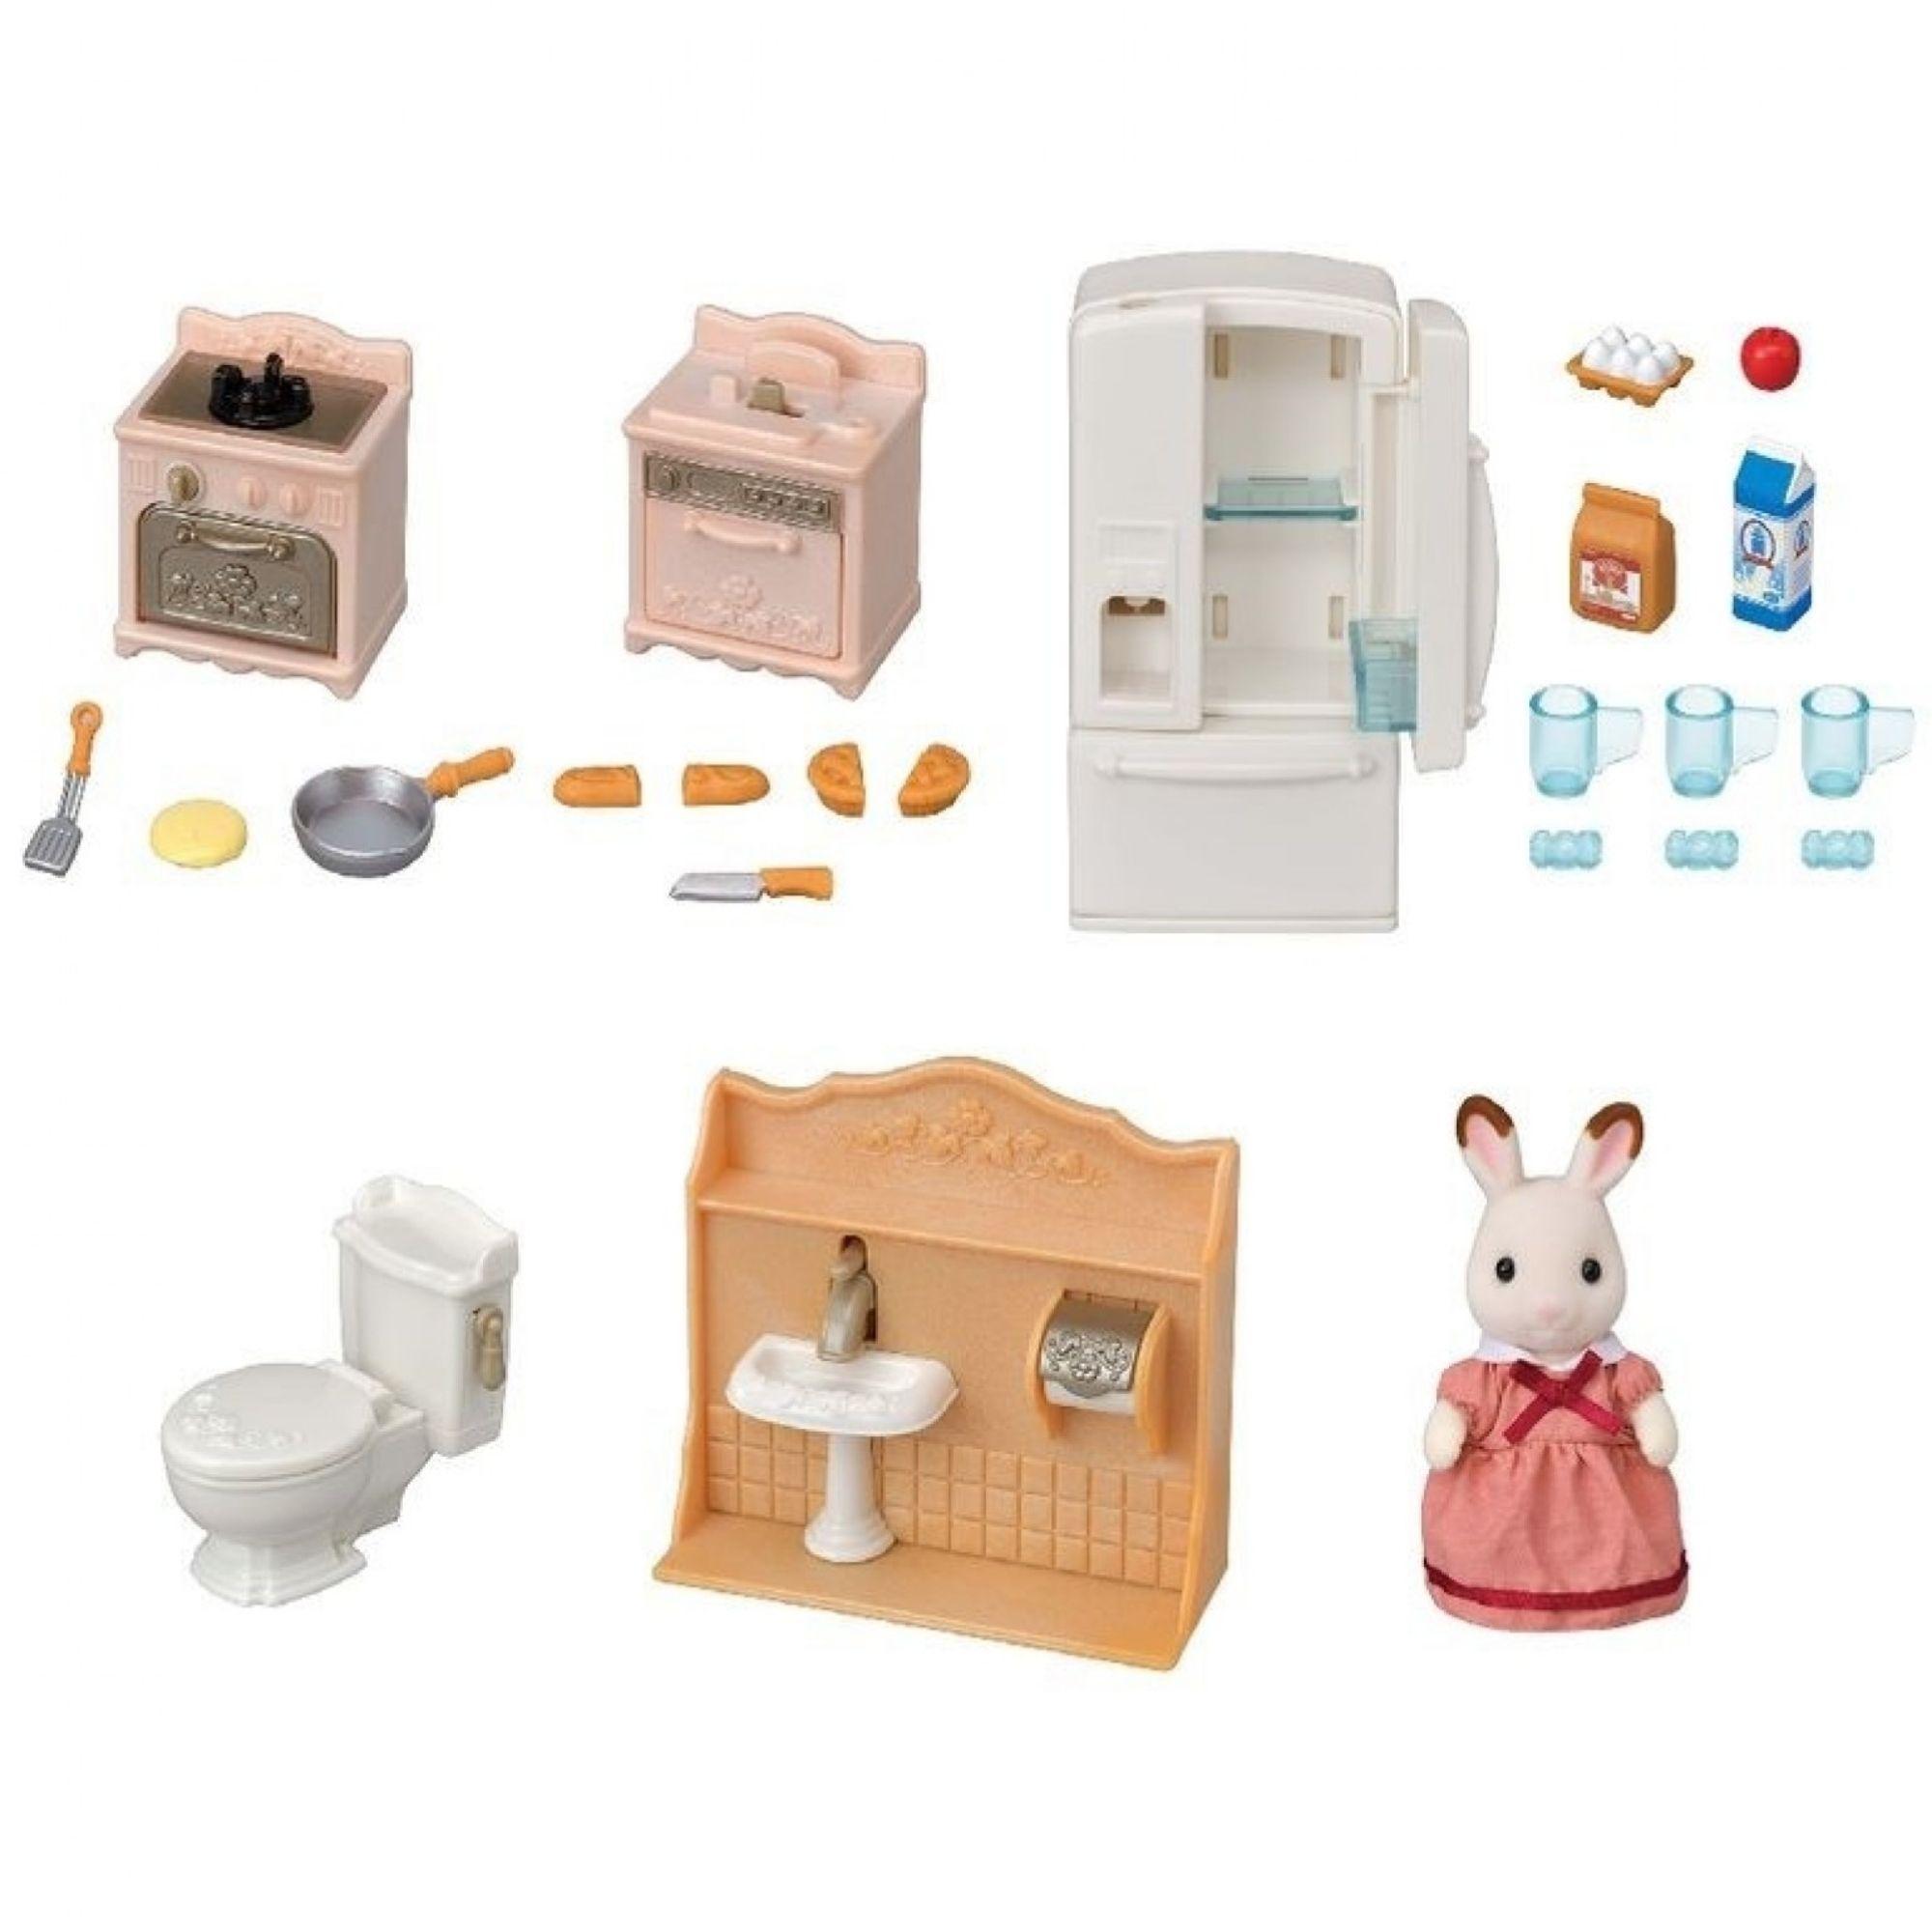 Brinquedo Sylvanian Families Conjunto Primeiros Moveis Divertidos 5449  - Game Land Brinquedos